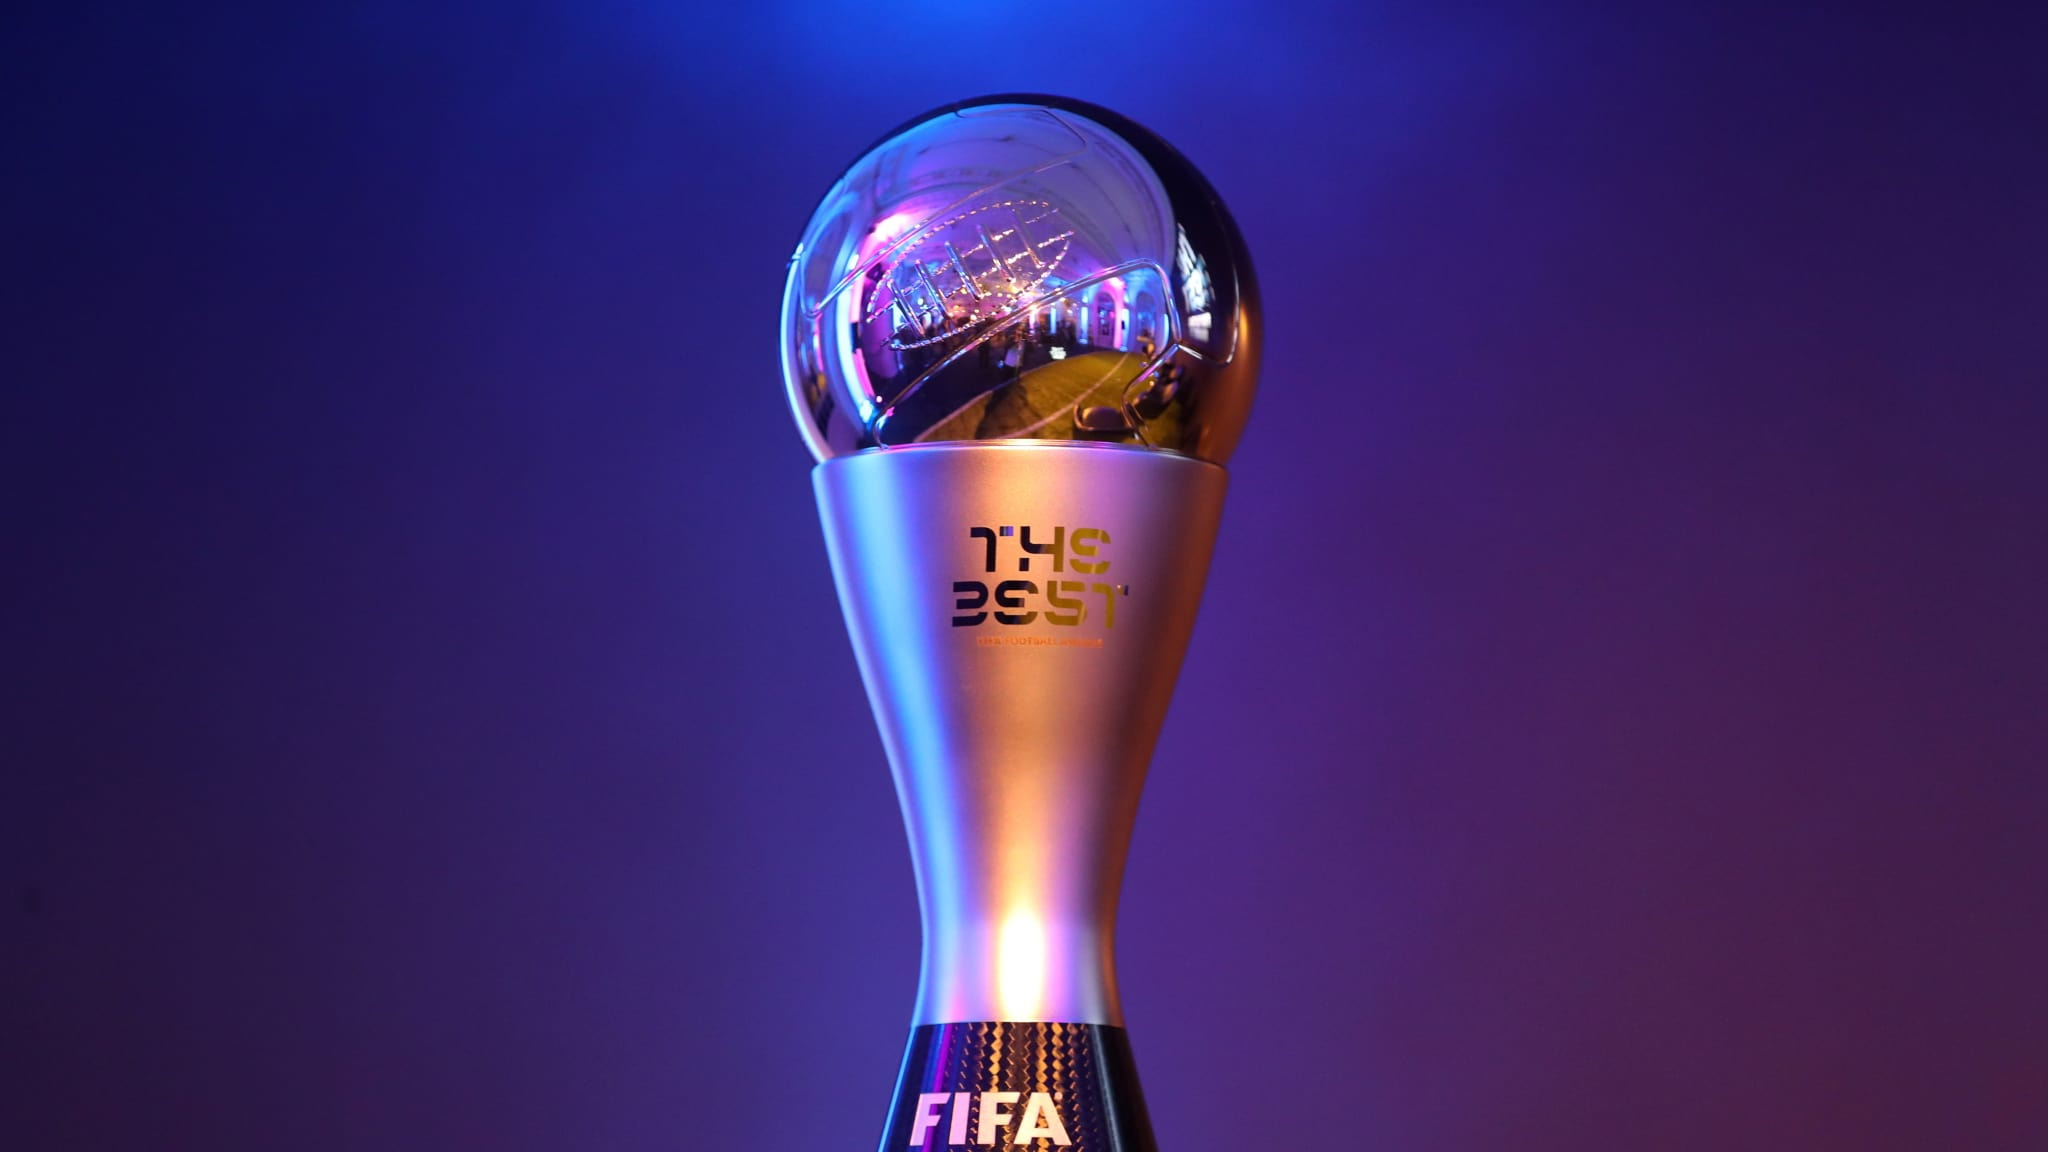 https: img.okezone.com content 2020 12 11 51 2325720 5-calon-pemain-terbaik-fifa-2020-per-desember-lewandowski-juaranya-5bCJLFqPal.jpg